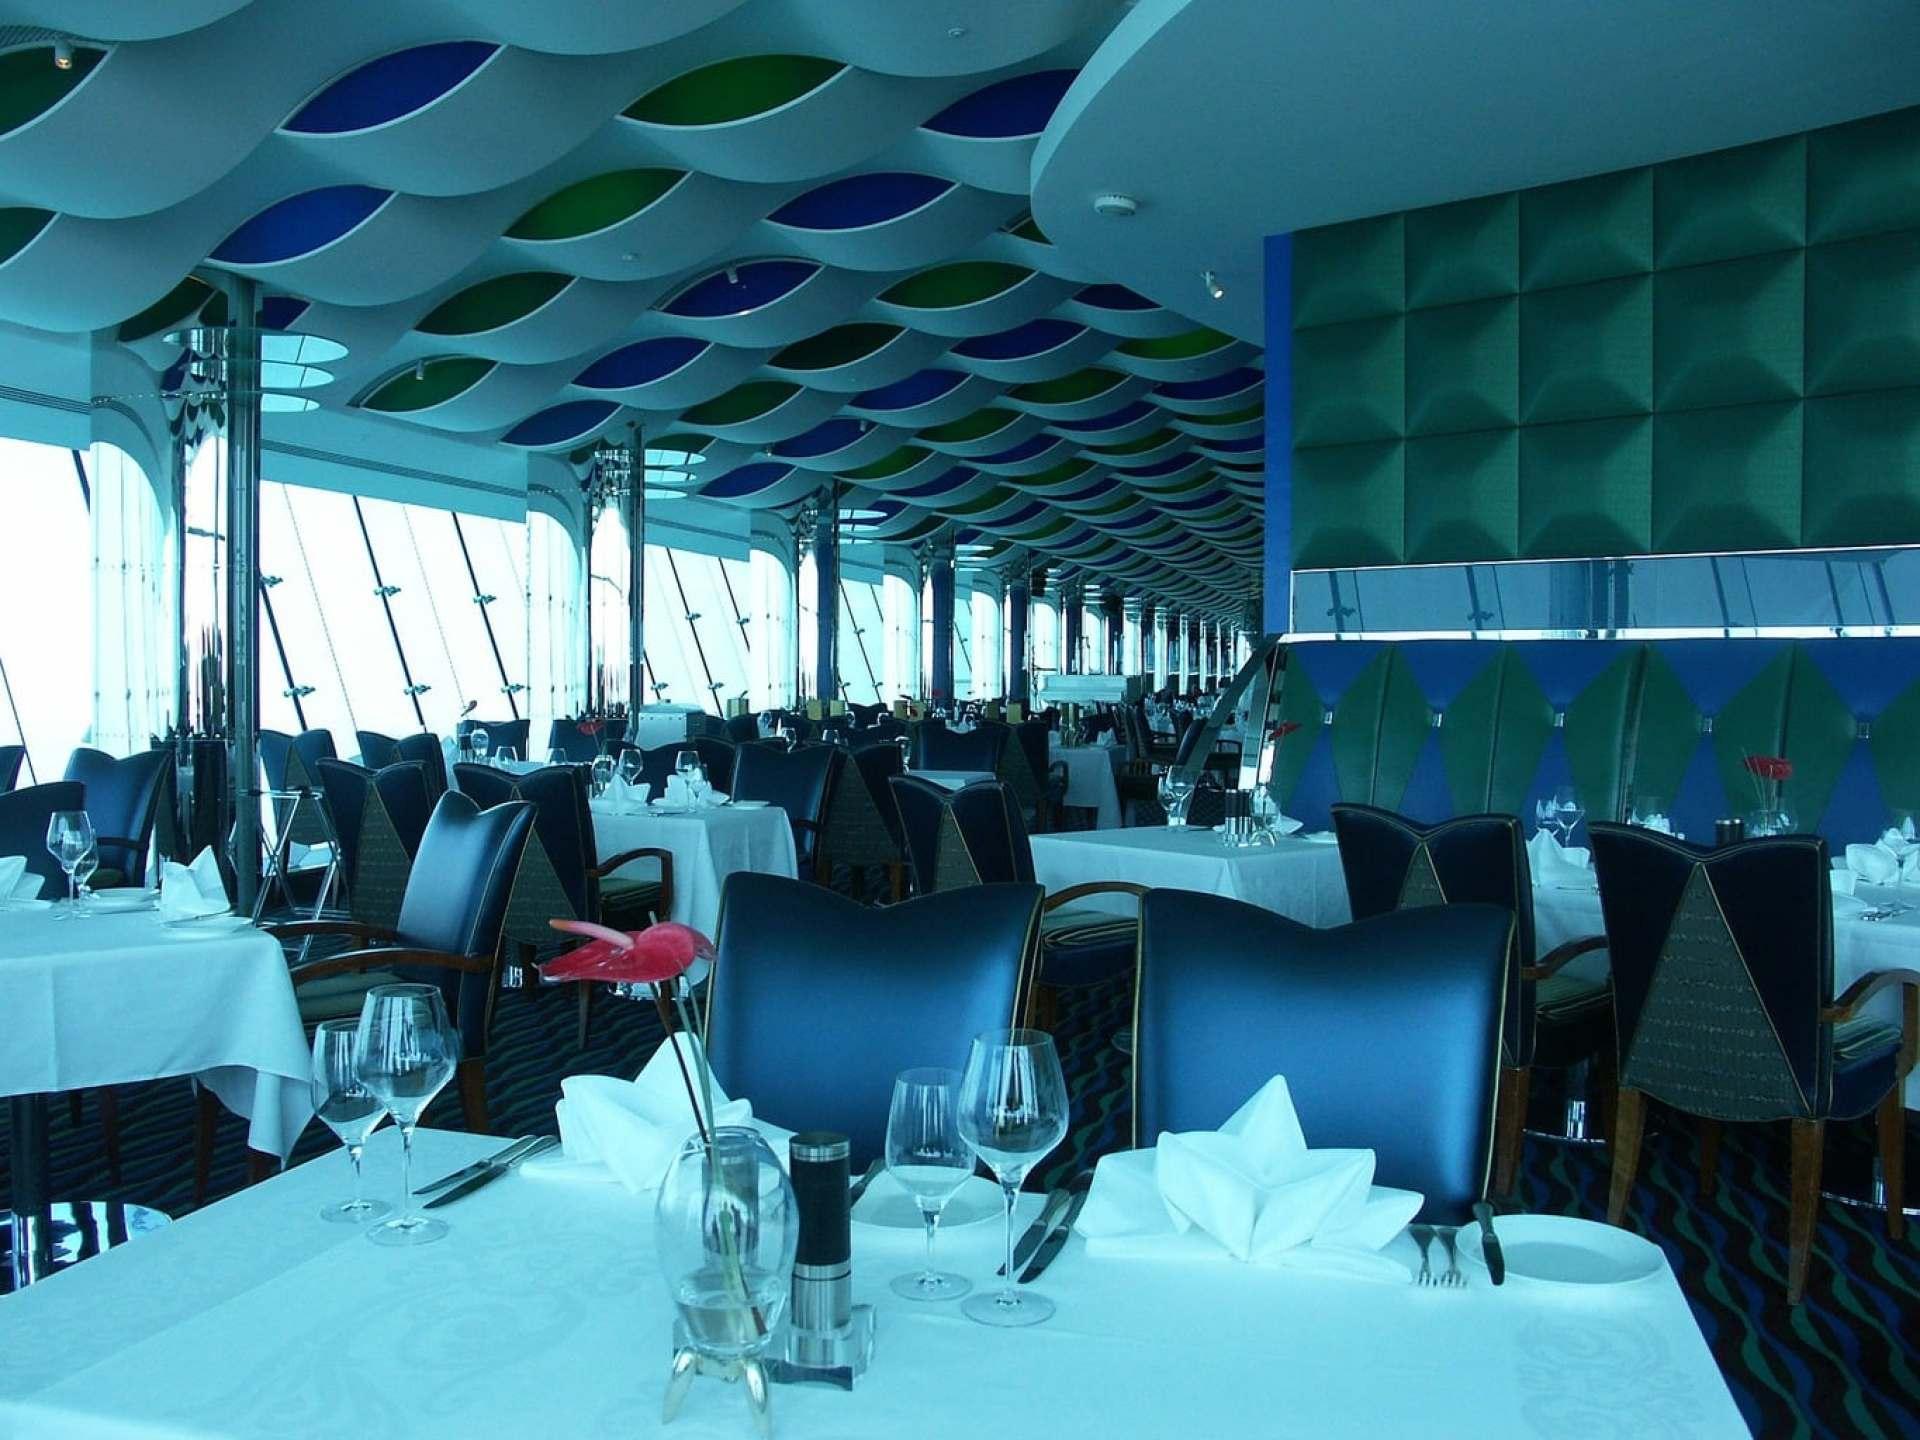 The restaurant at the top floor of the Burj Al Arab